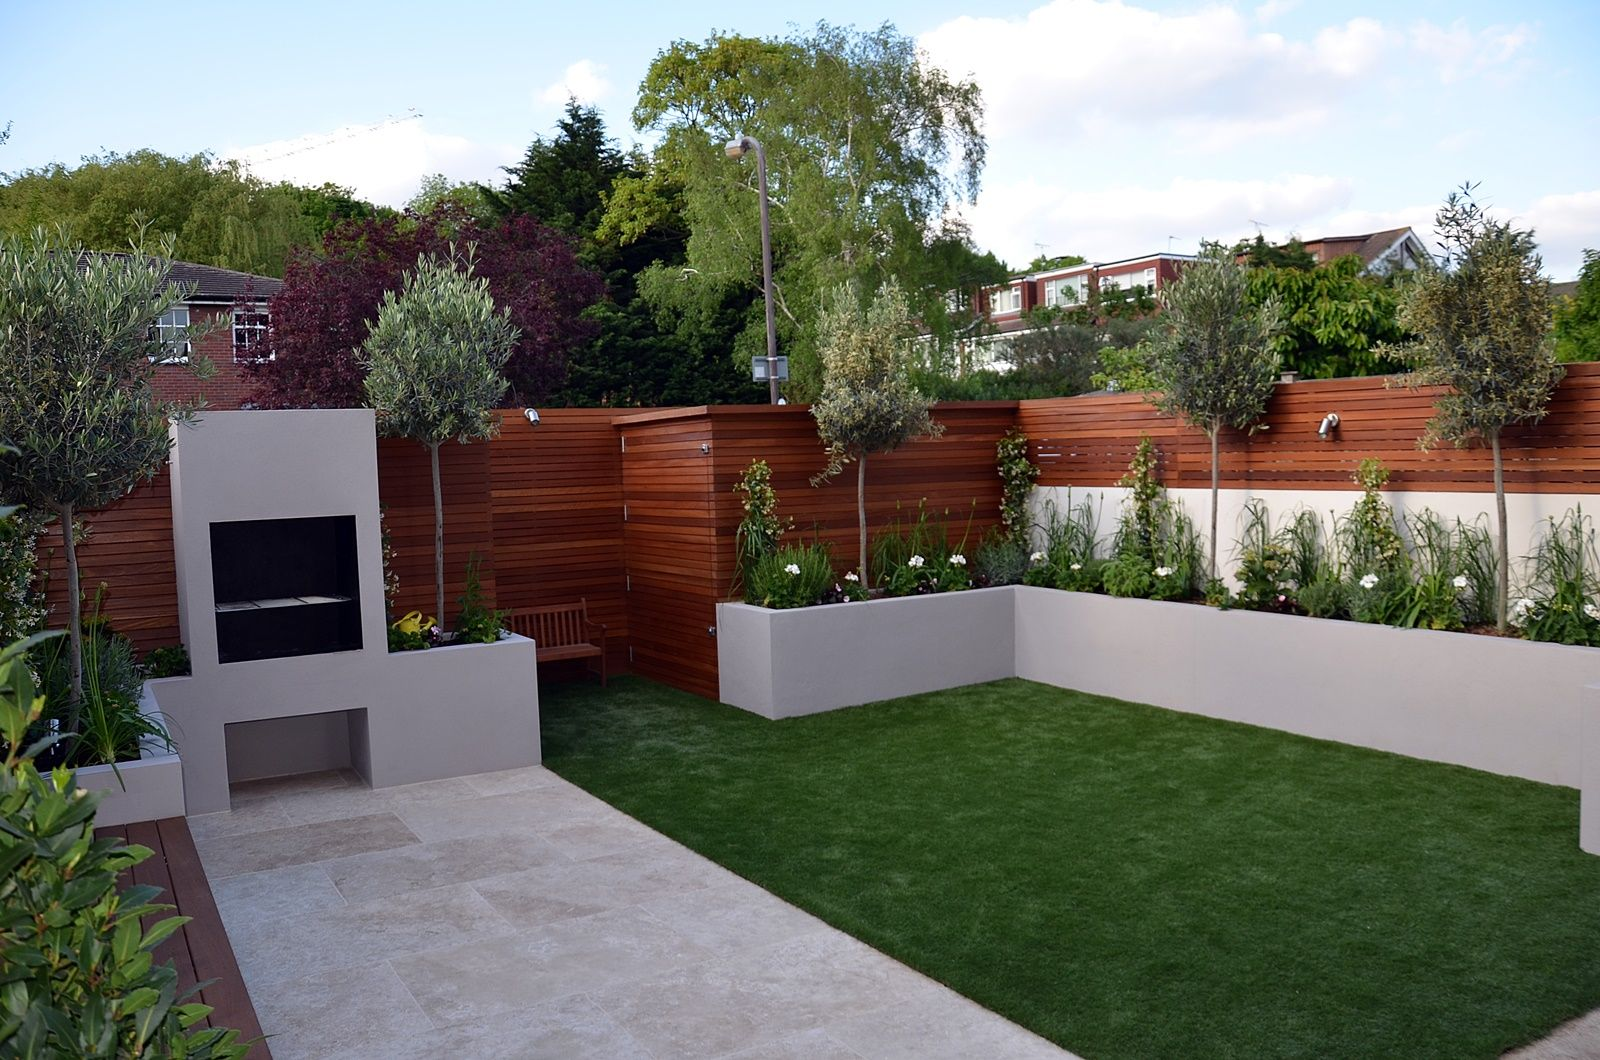 Jardines de diseo moderno fotos de jardines casas for Paisajismo jardines modernos